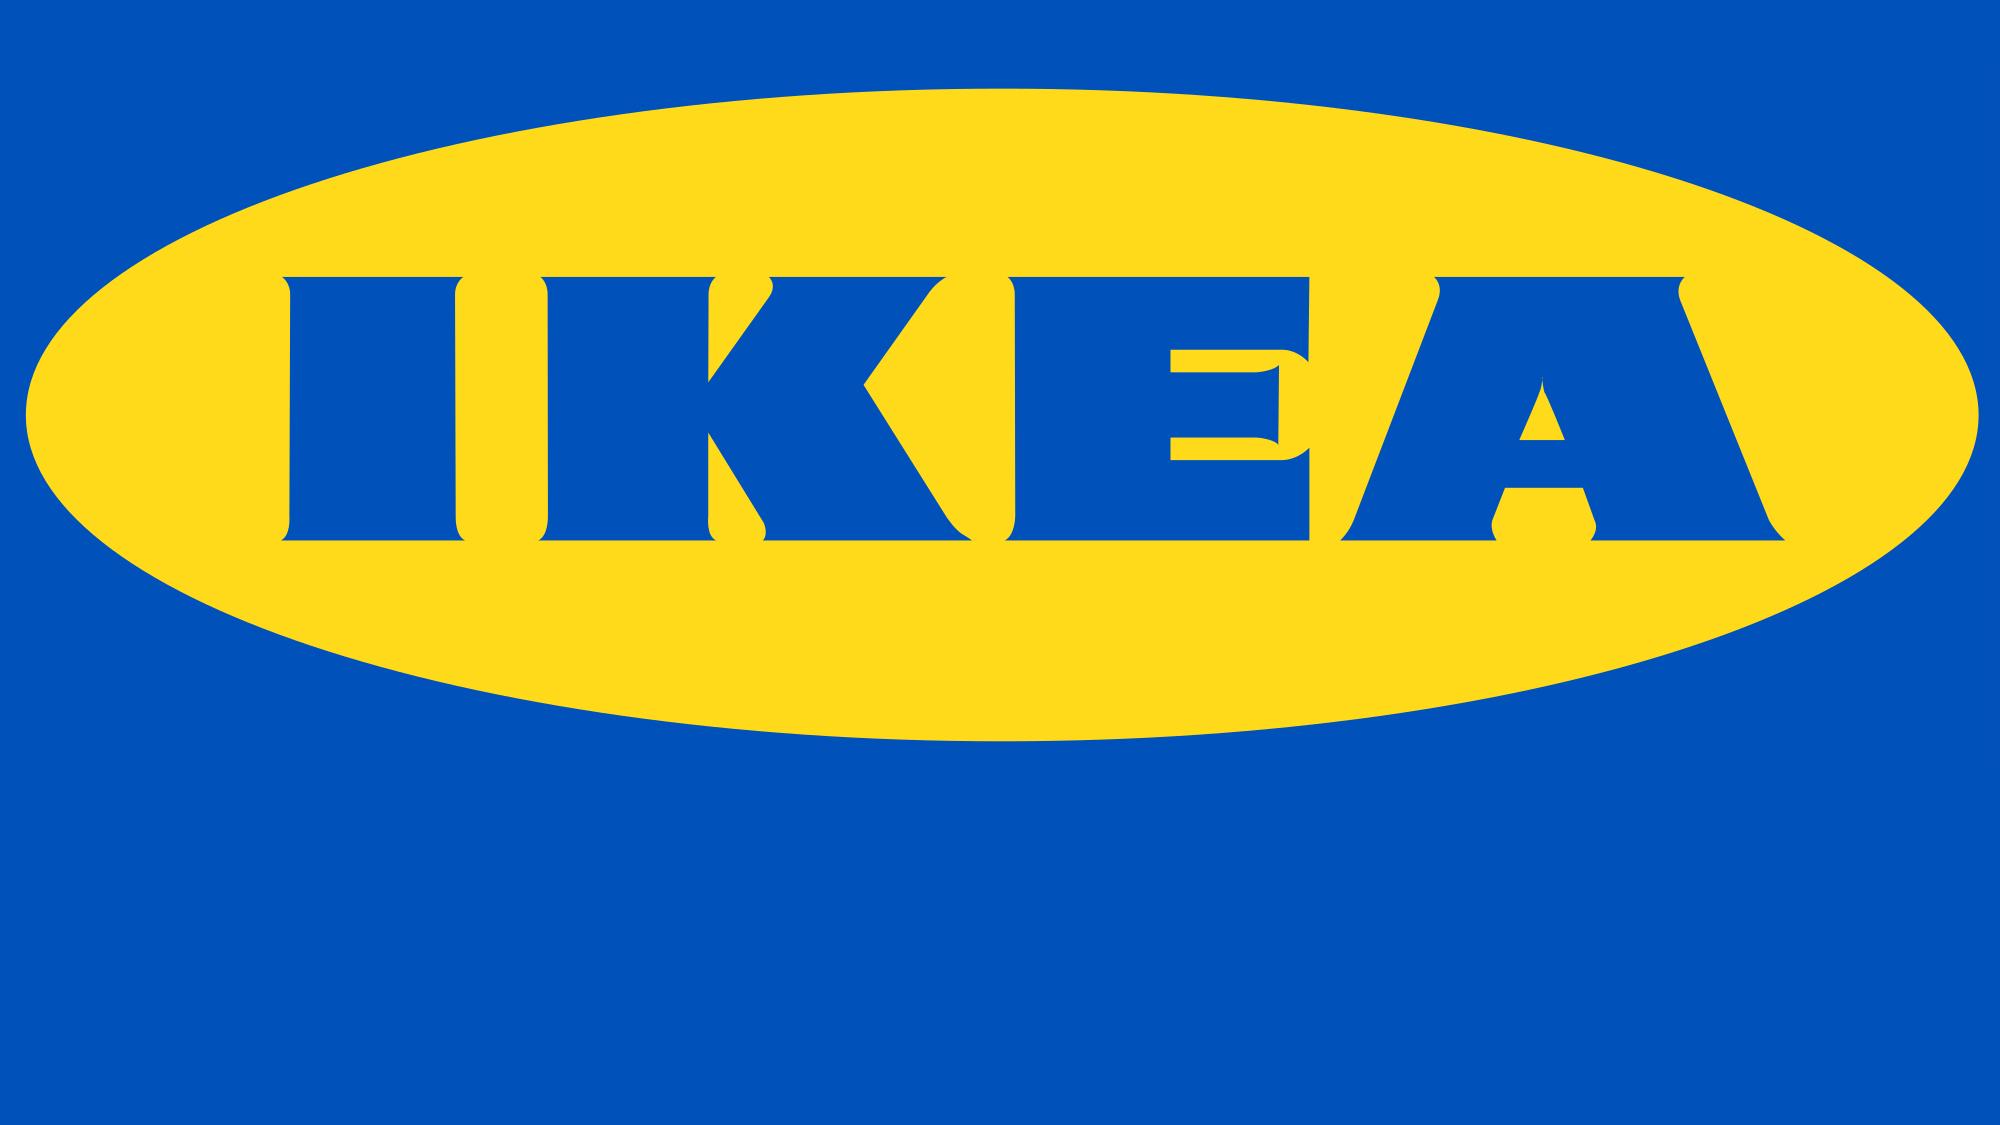 Ikea teaser